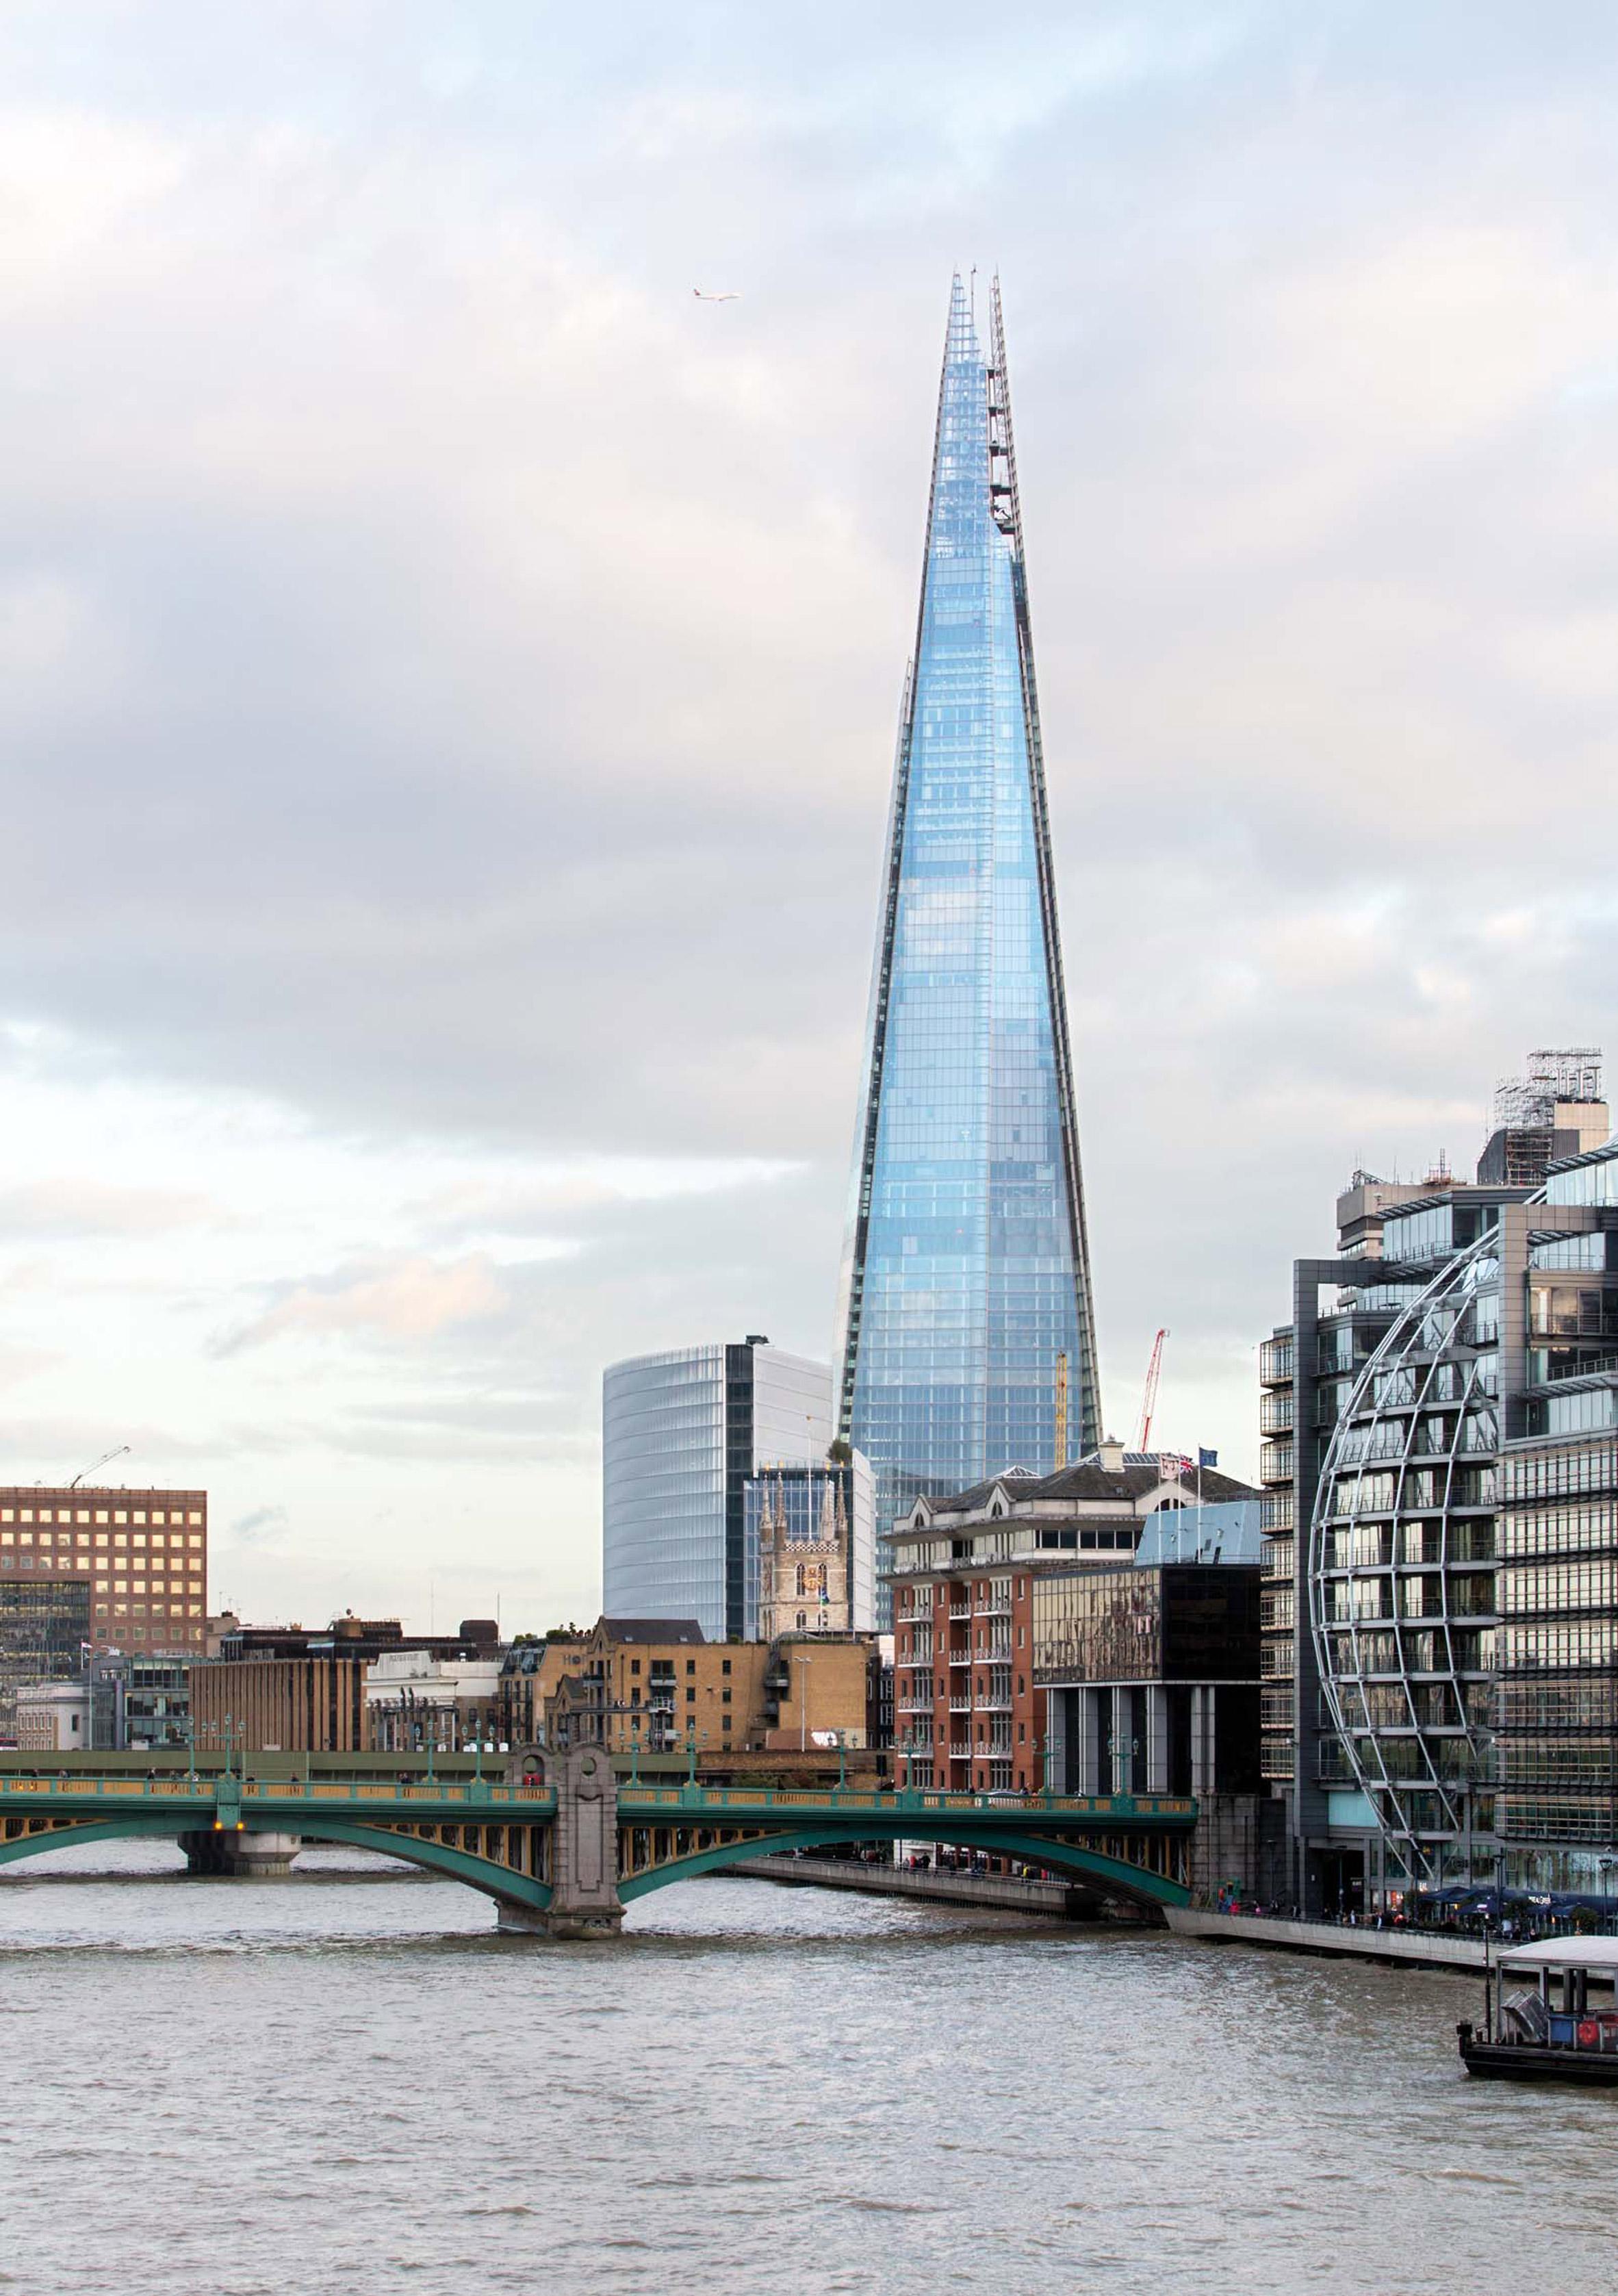 High-tech architecture: Renzo Piano